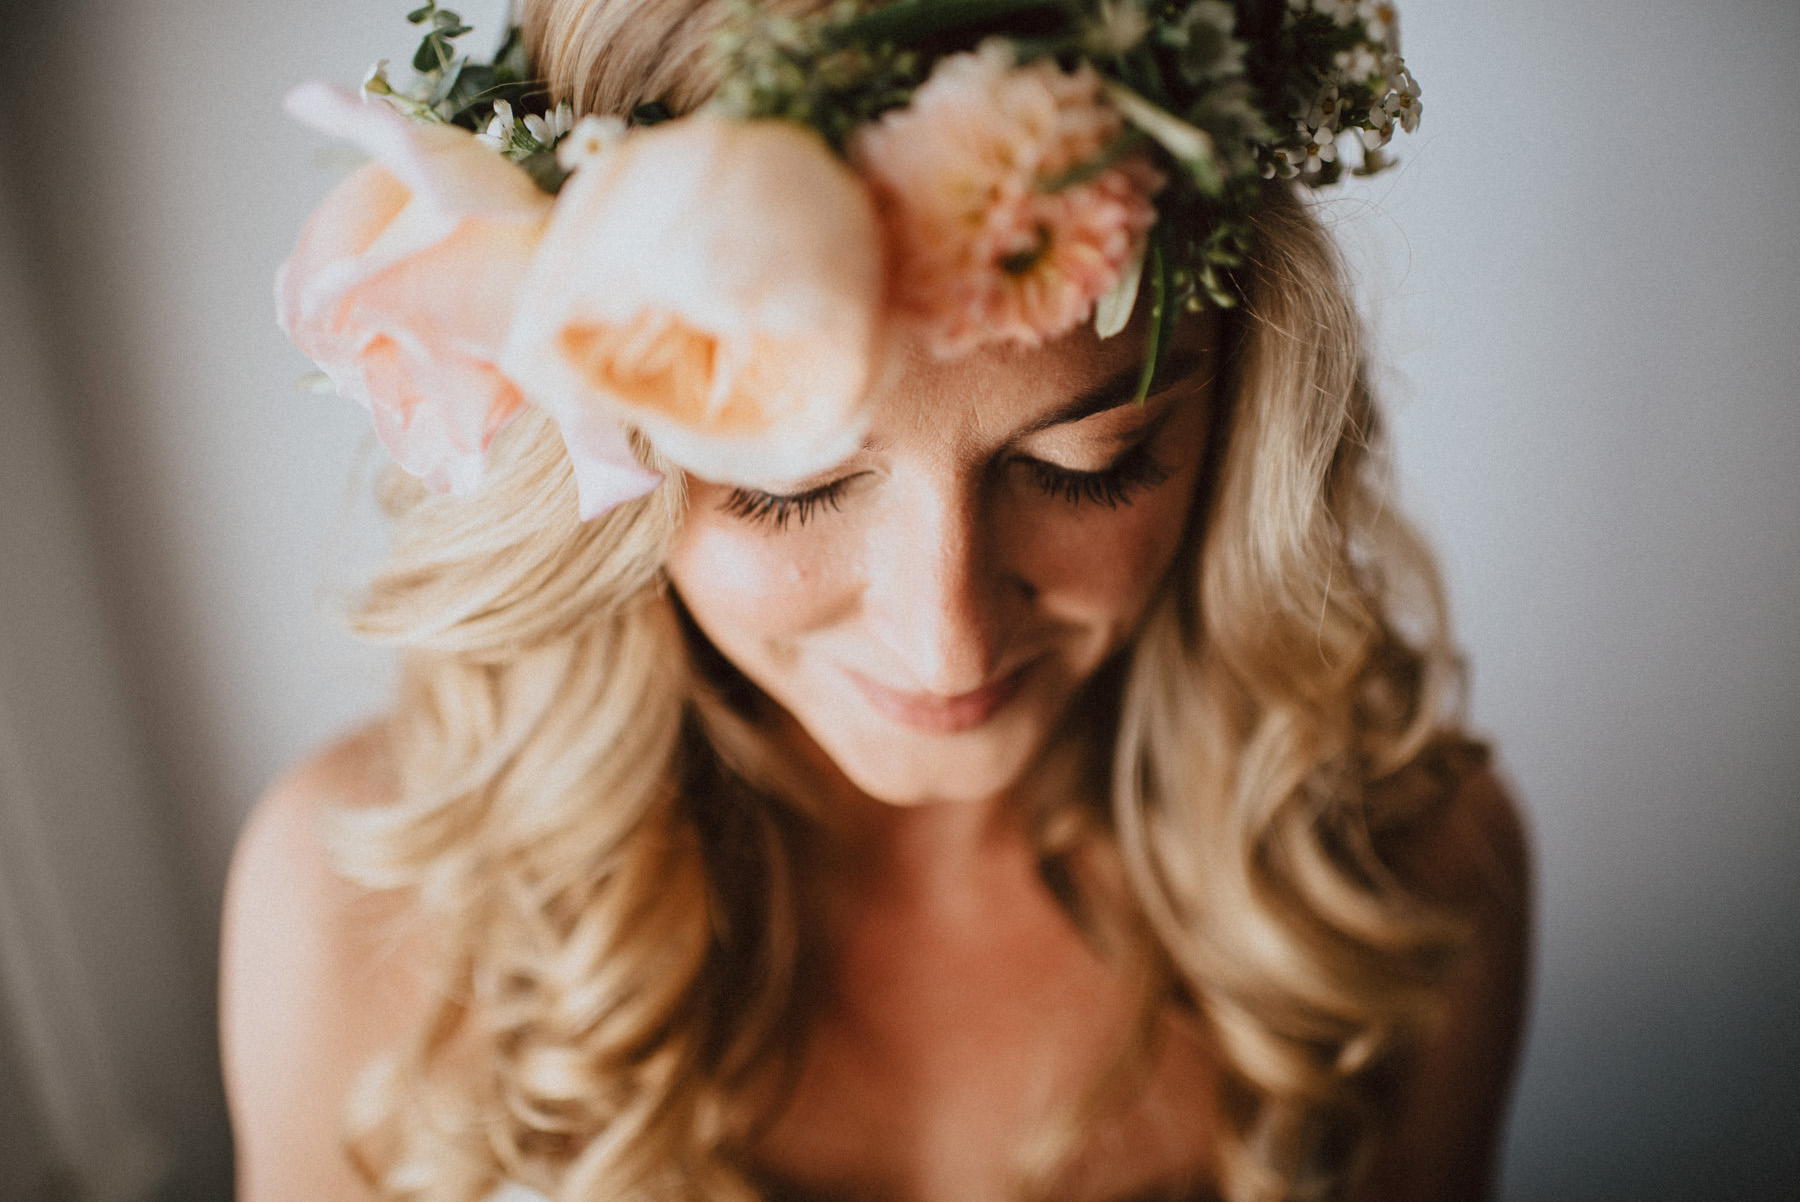 063-la-cherie-philly-wedding-6.jpg